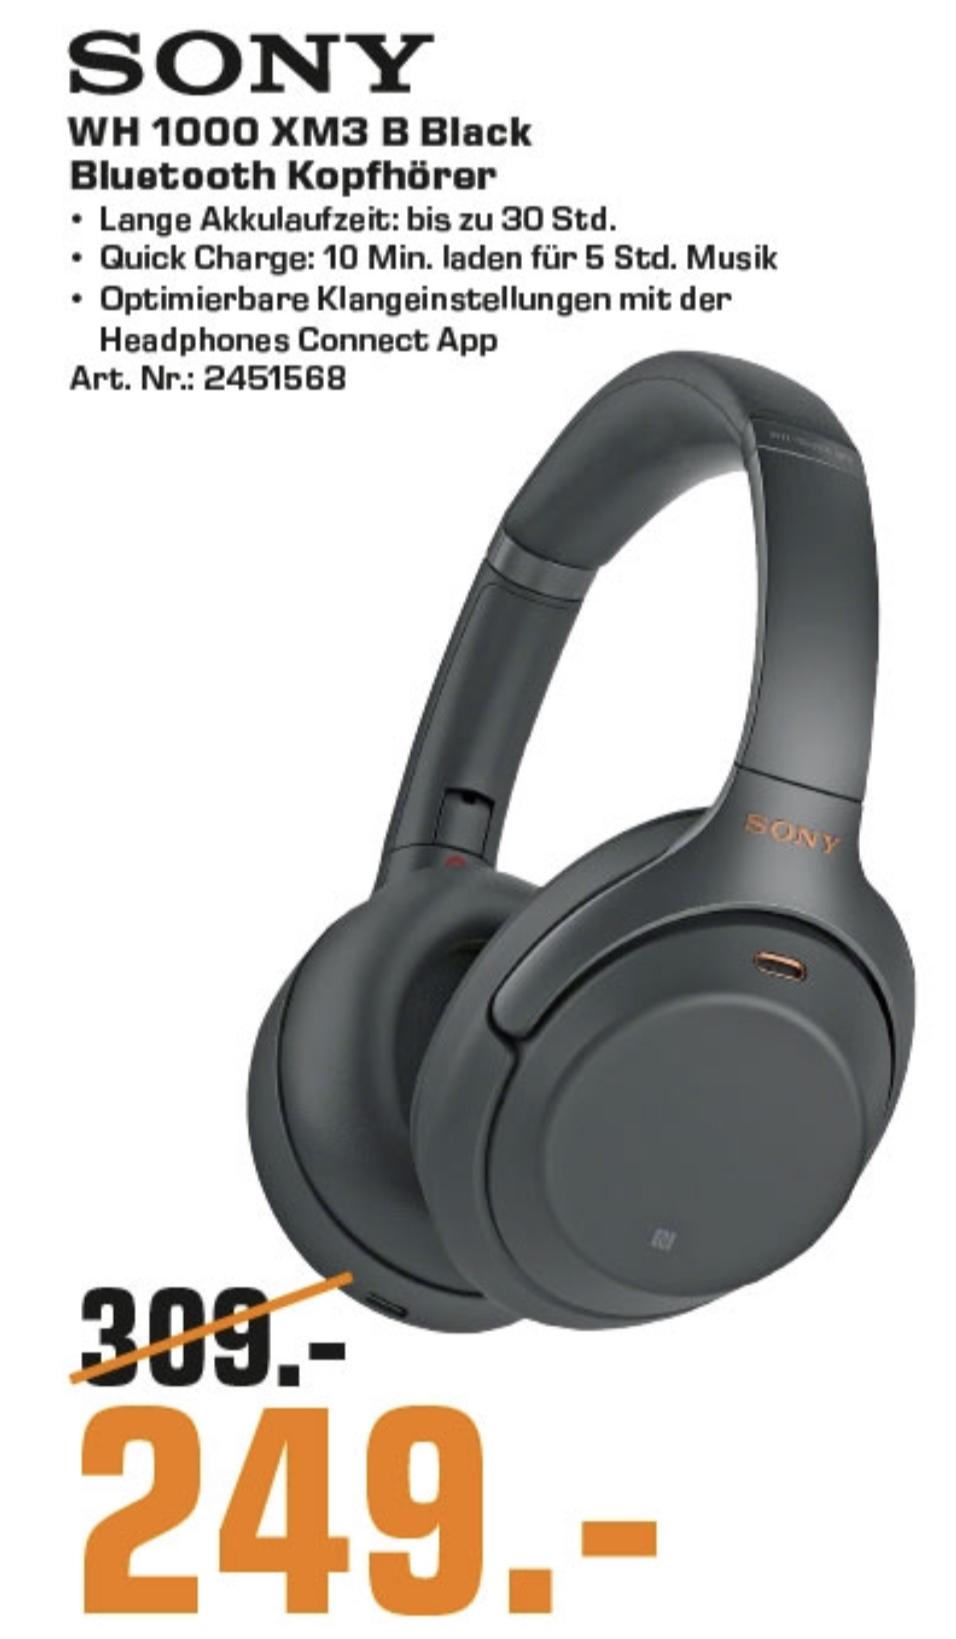 Lokal Saturn Krefeld, Moers, Mönchengladbach: Sony WH-1000XM3 Noise Cancelling Kopfhörer für 249€